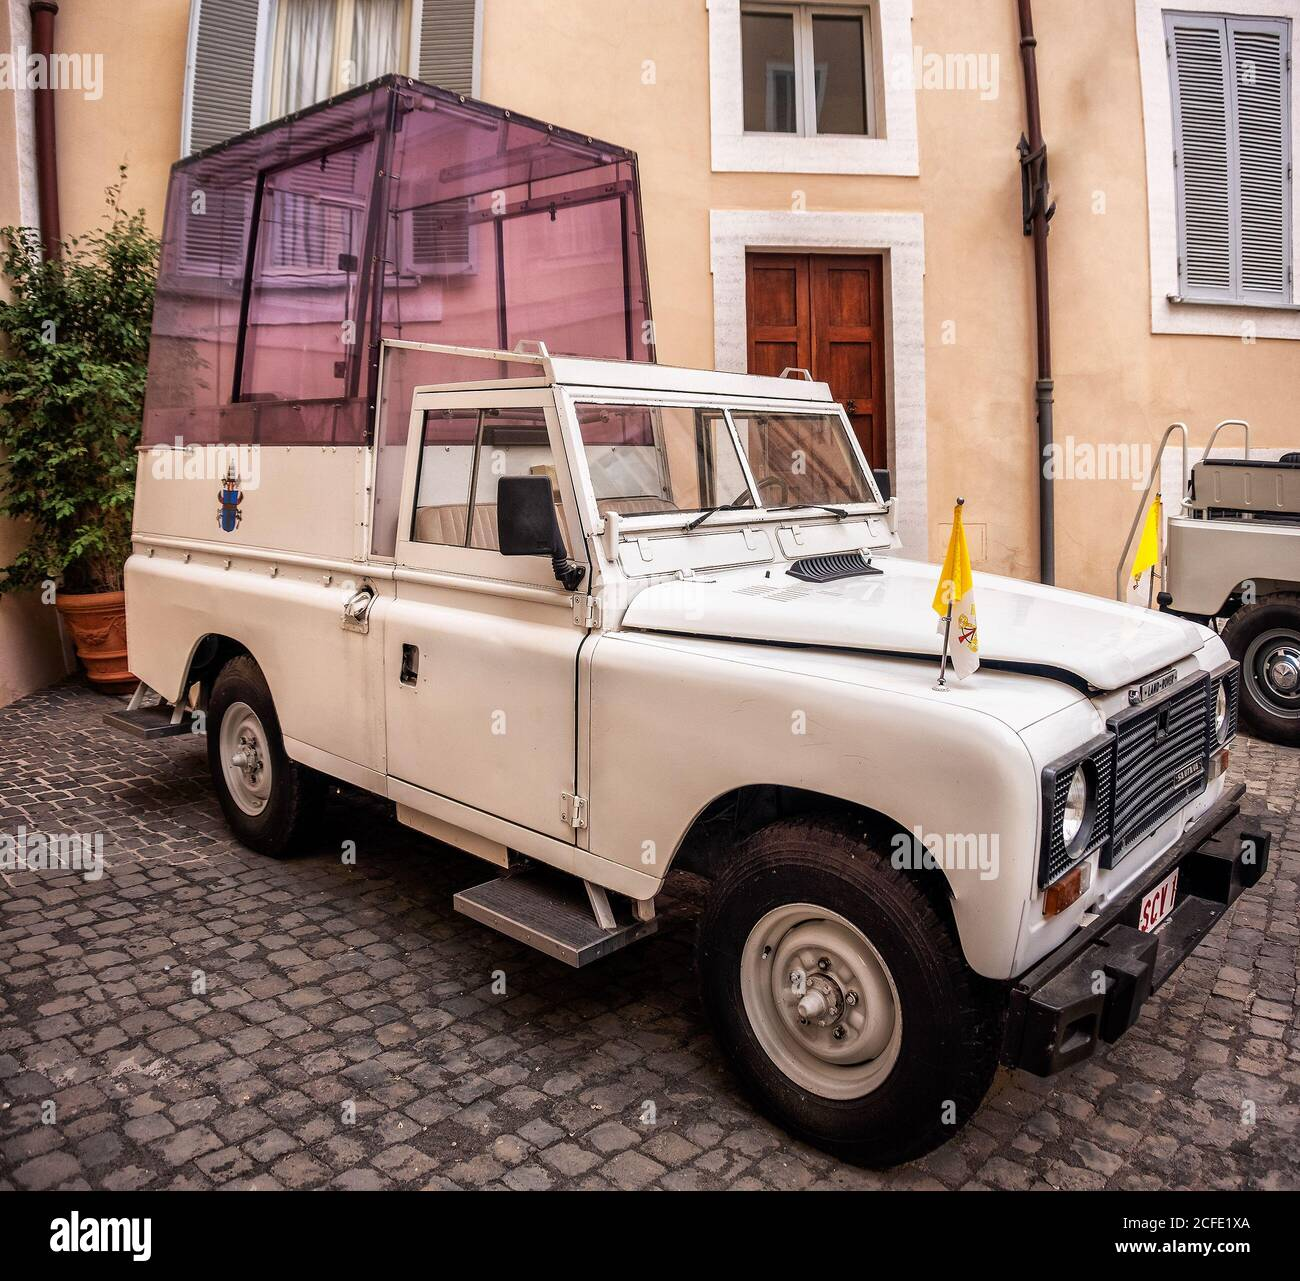 Popemobile of Pope Wojtyla John Paul II, the model is a Land Rover Santana Stock Photo